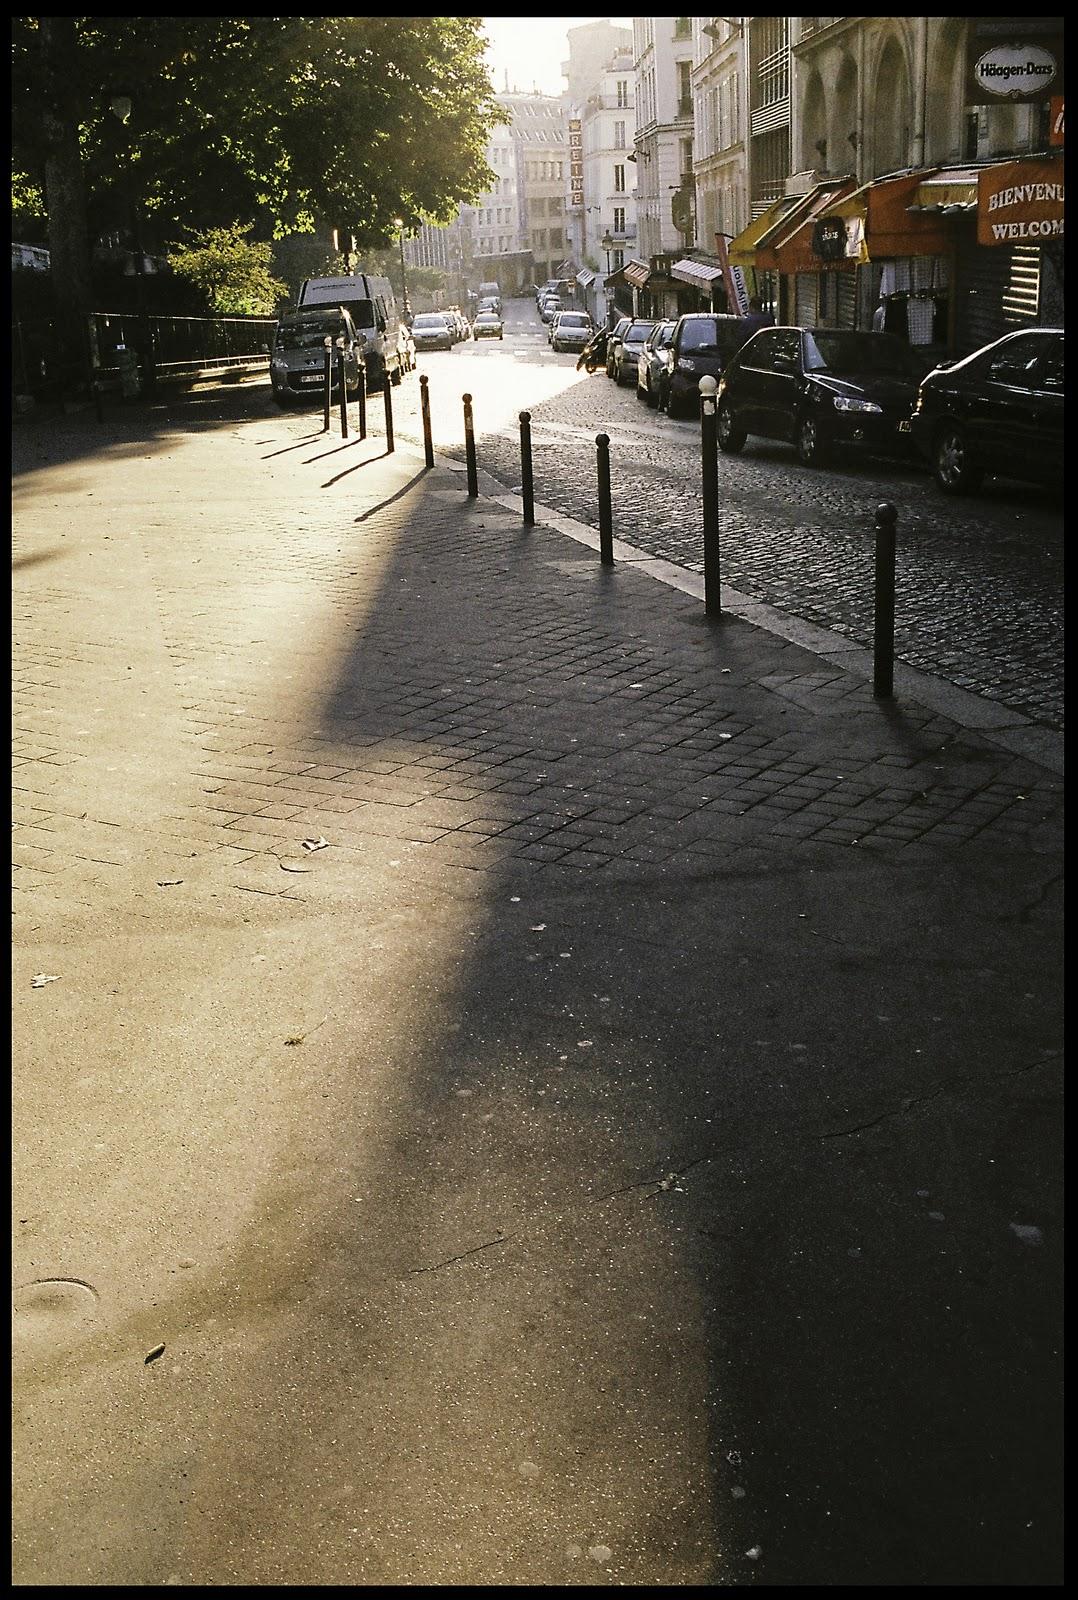 Walter beckham 39 s photo blog september 2011 - Place saint pierre paris ...